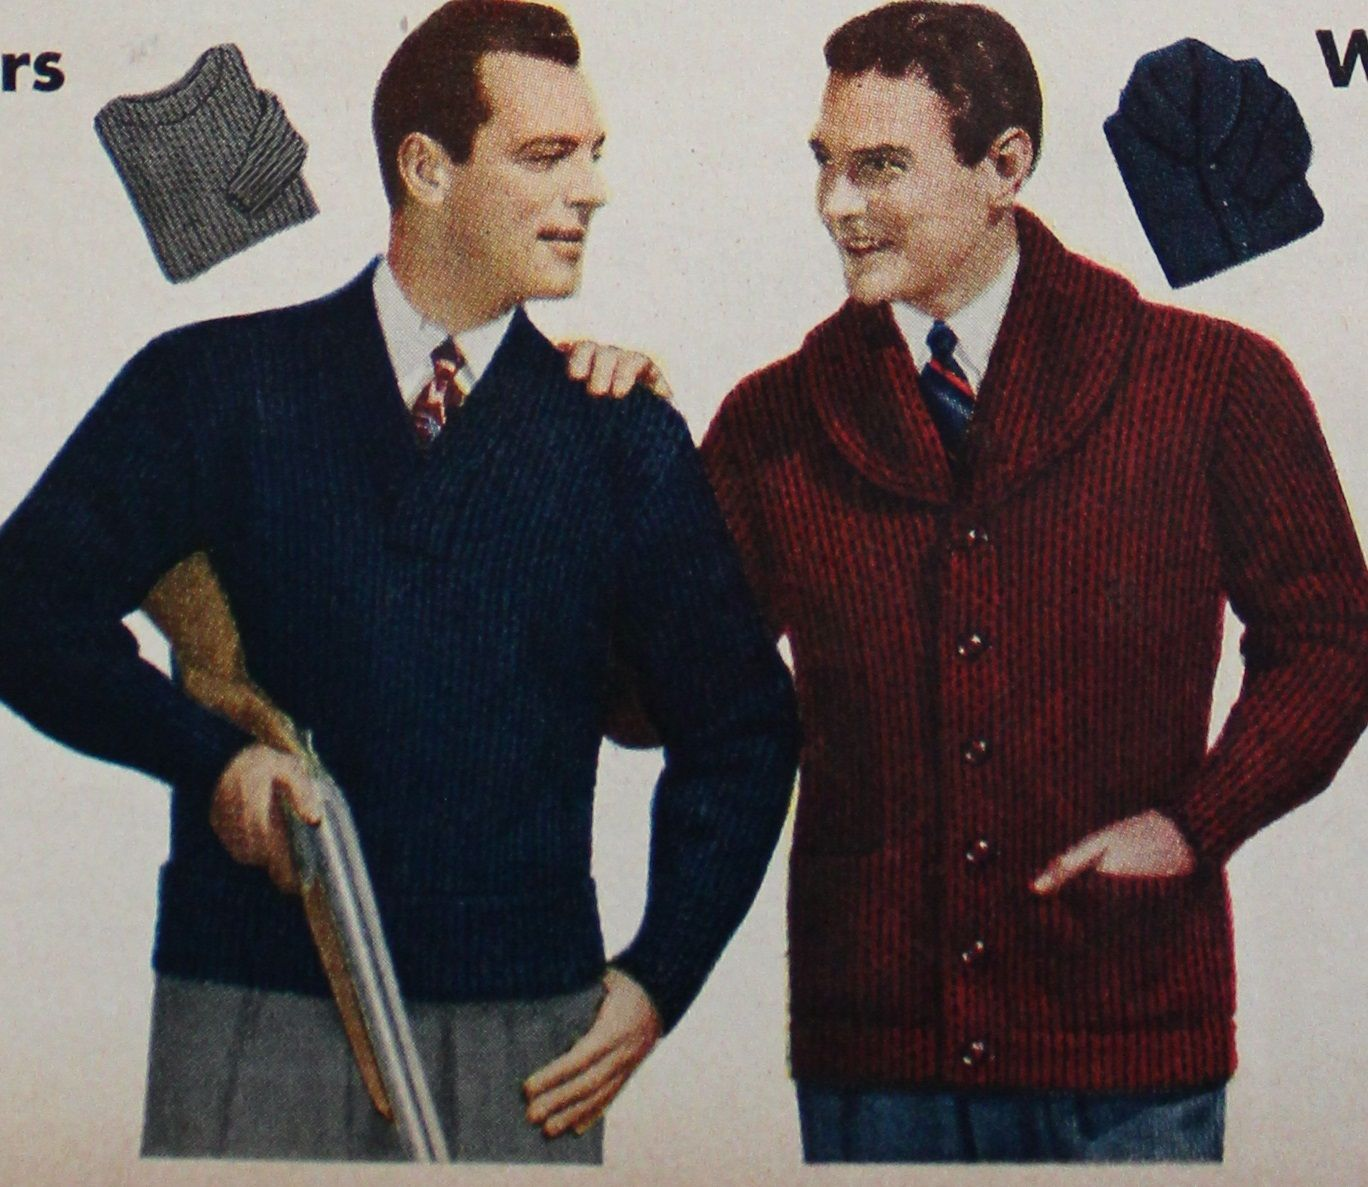 1940s Men's Fashion Clothing Styles   Mens fashion ...